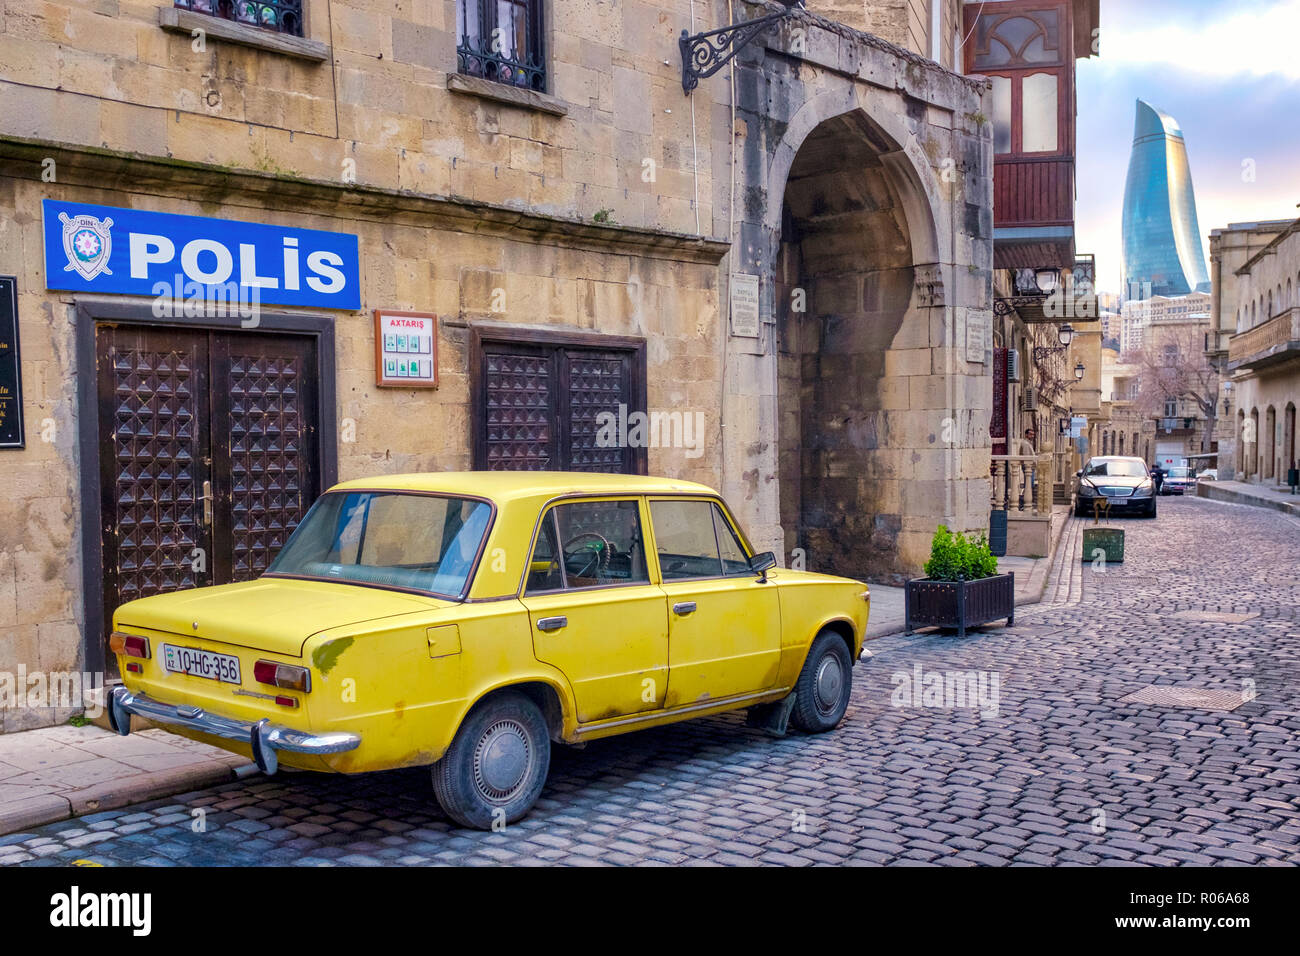 Old yellow soviet car (Moskvitch) in Icheri Sheher (Old City), Baku, Azerbaijan - Stock Image